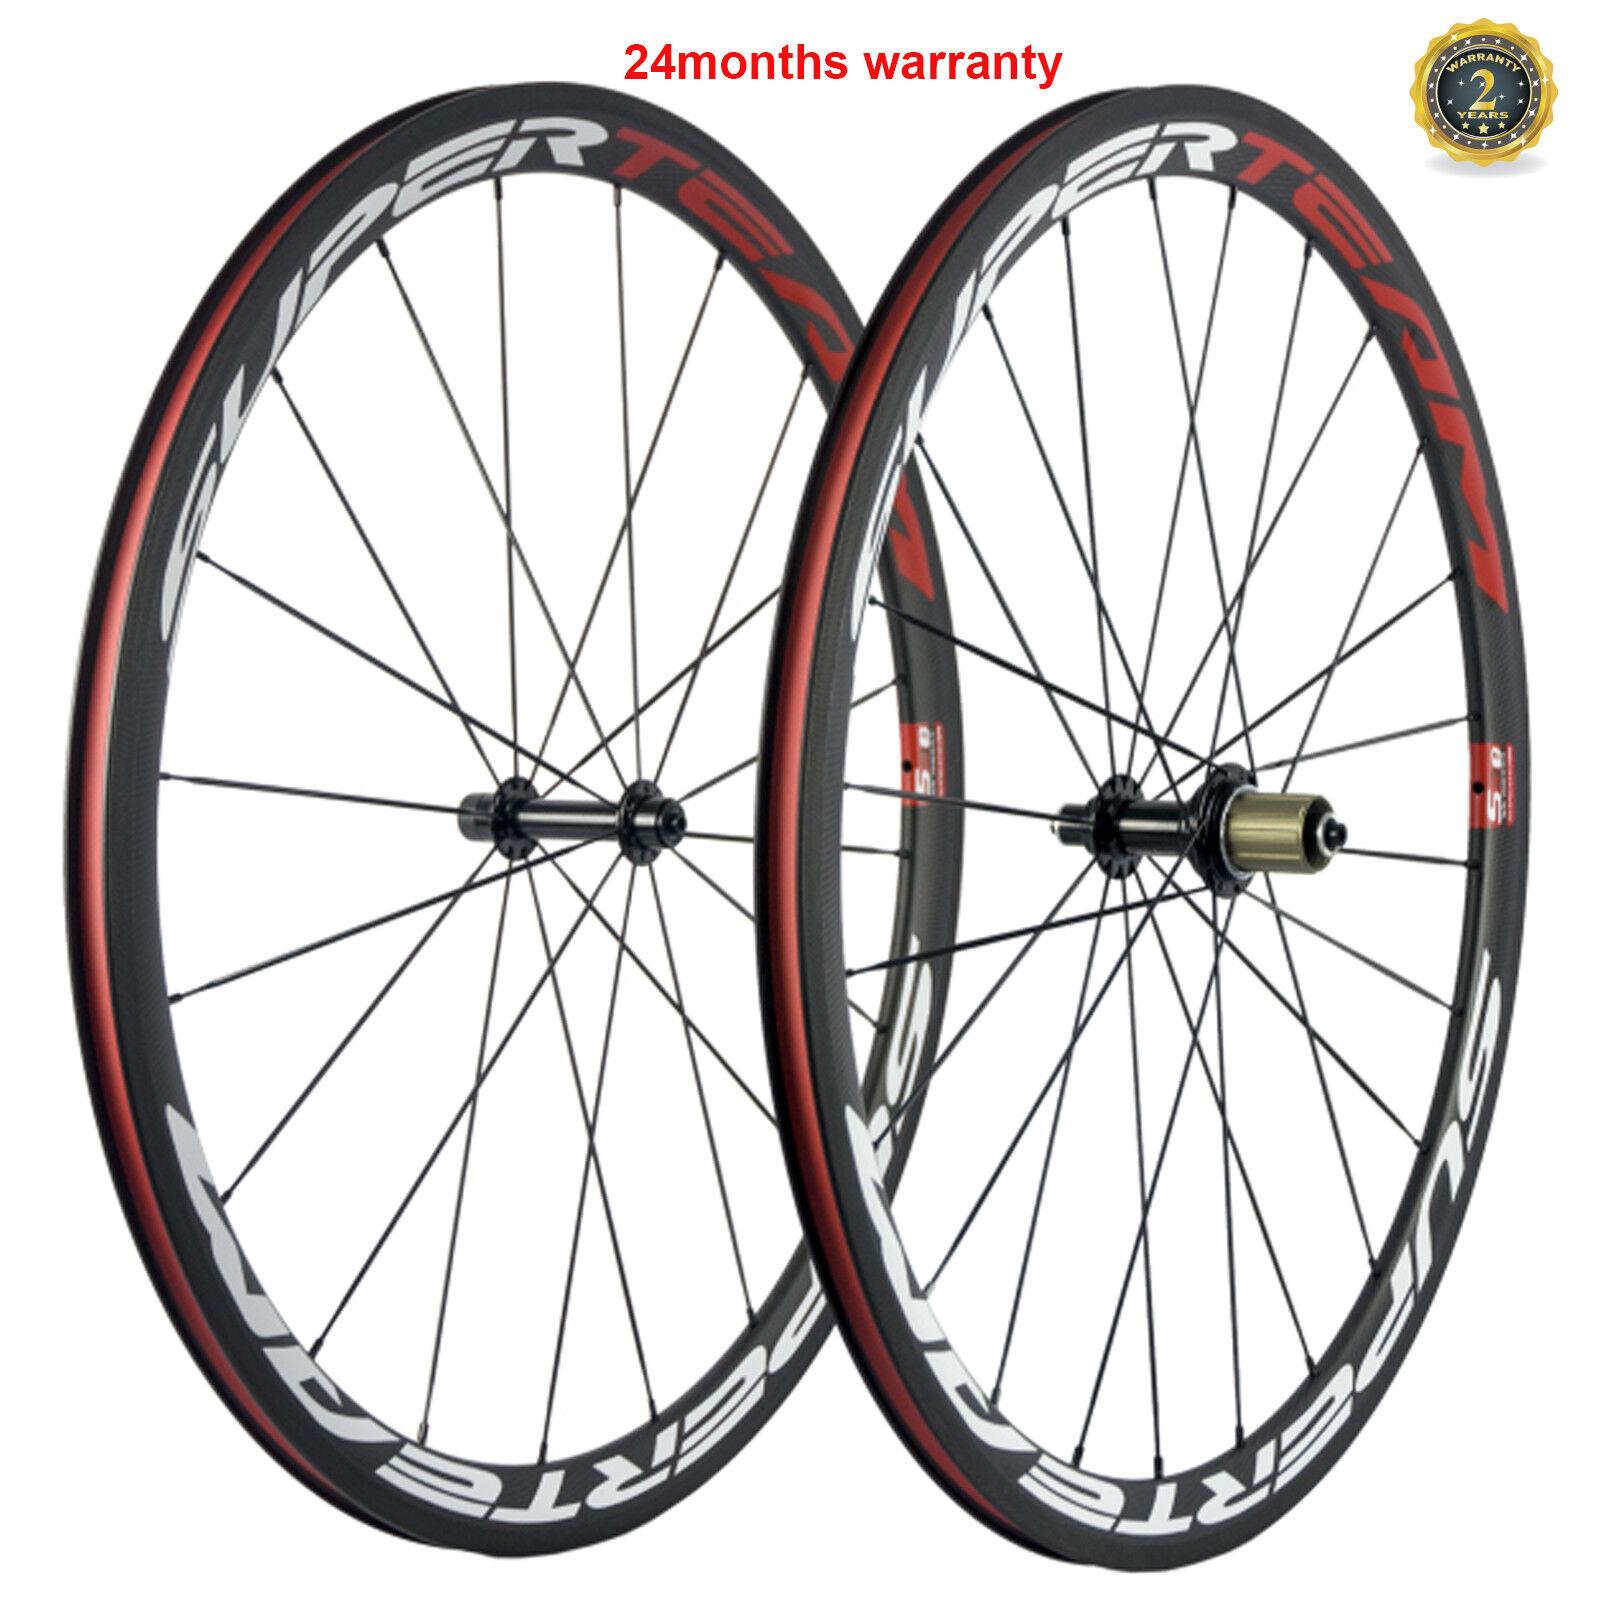 38mm Carbon Wheelset Clincher Road Bike Wheels  R13 Hub Race Wheel Basalt Wheels  low prices